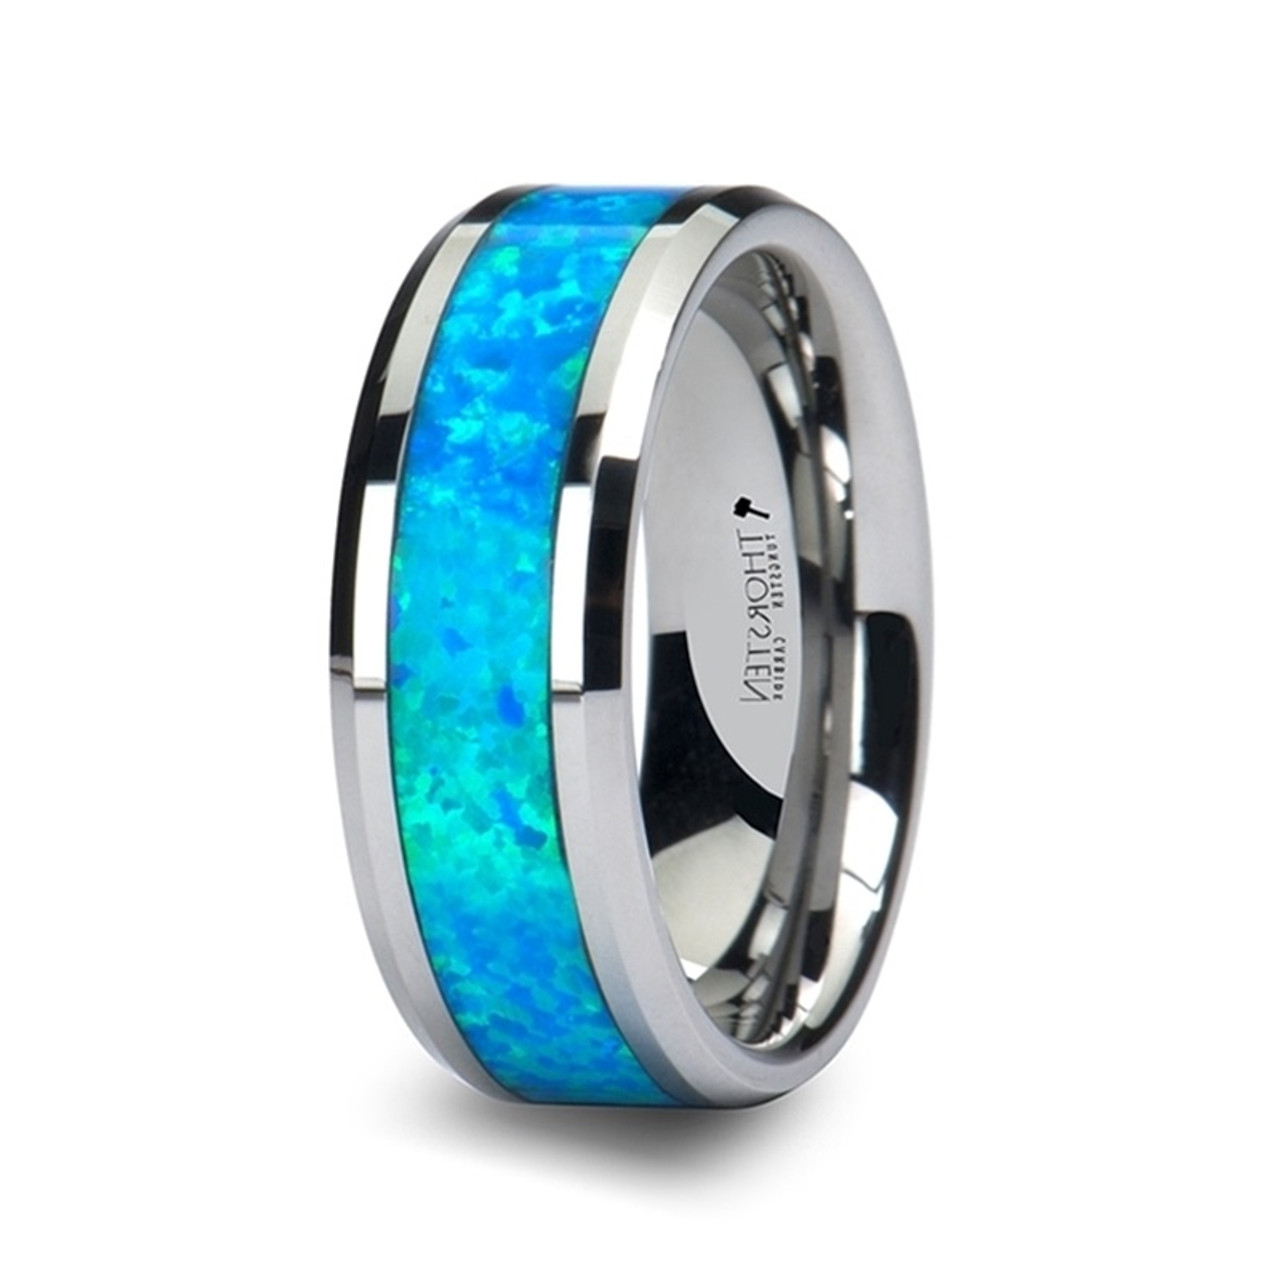 Men S Tungsten Wedding Band With Blue Green Opal Inlay Titanium Buzz